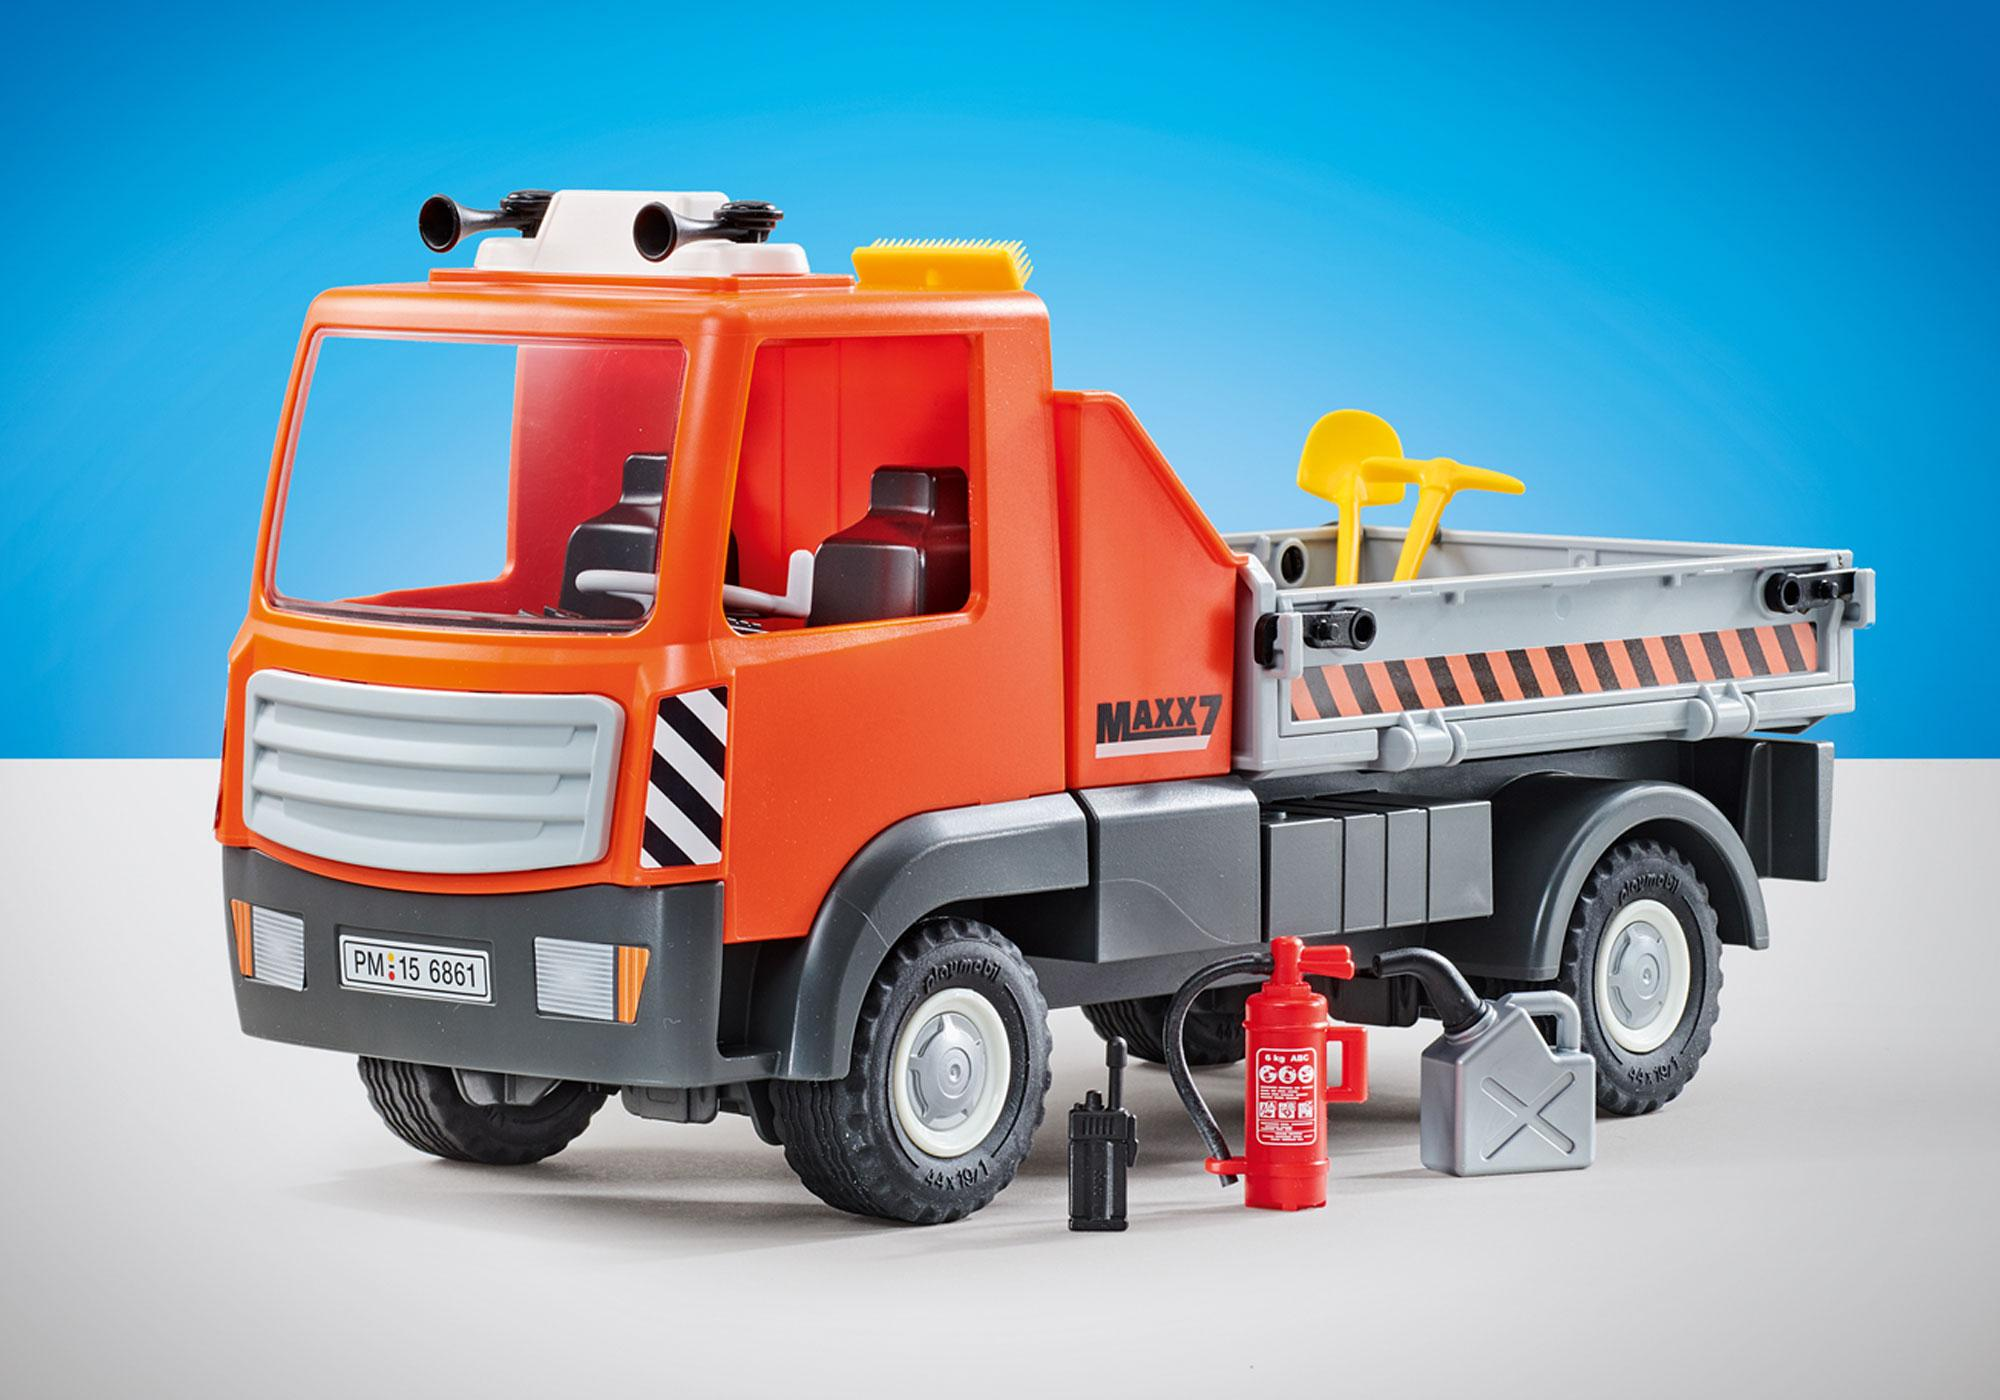 9801_product_detail/Φορτηγό έργων οδοποιίας